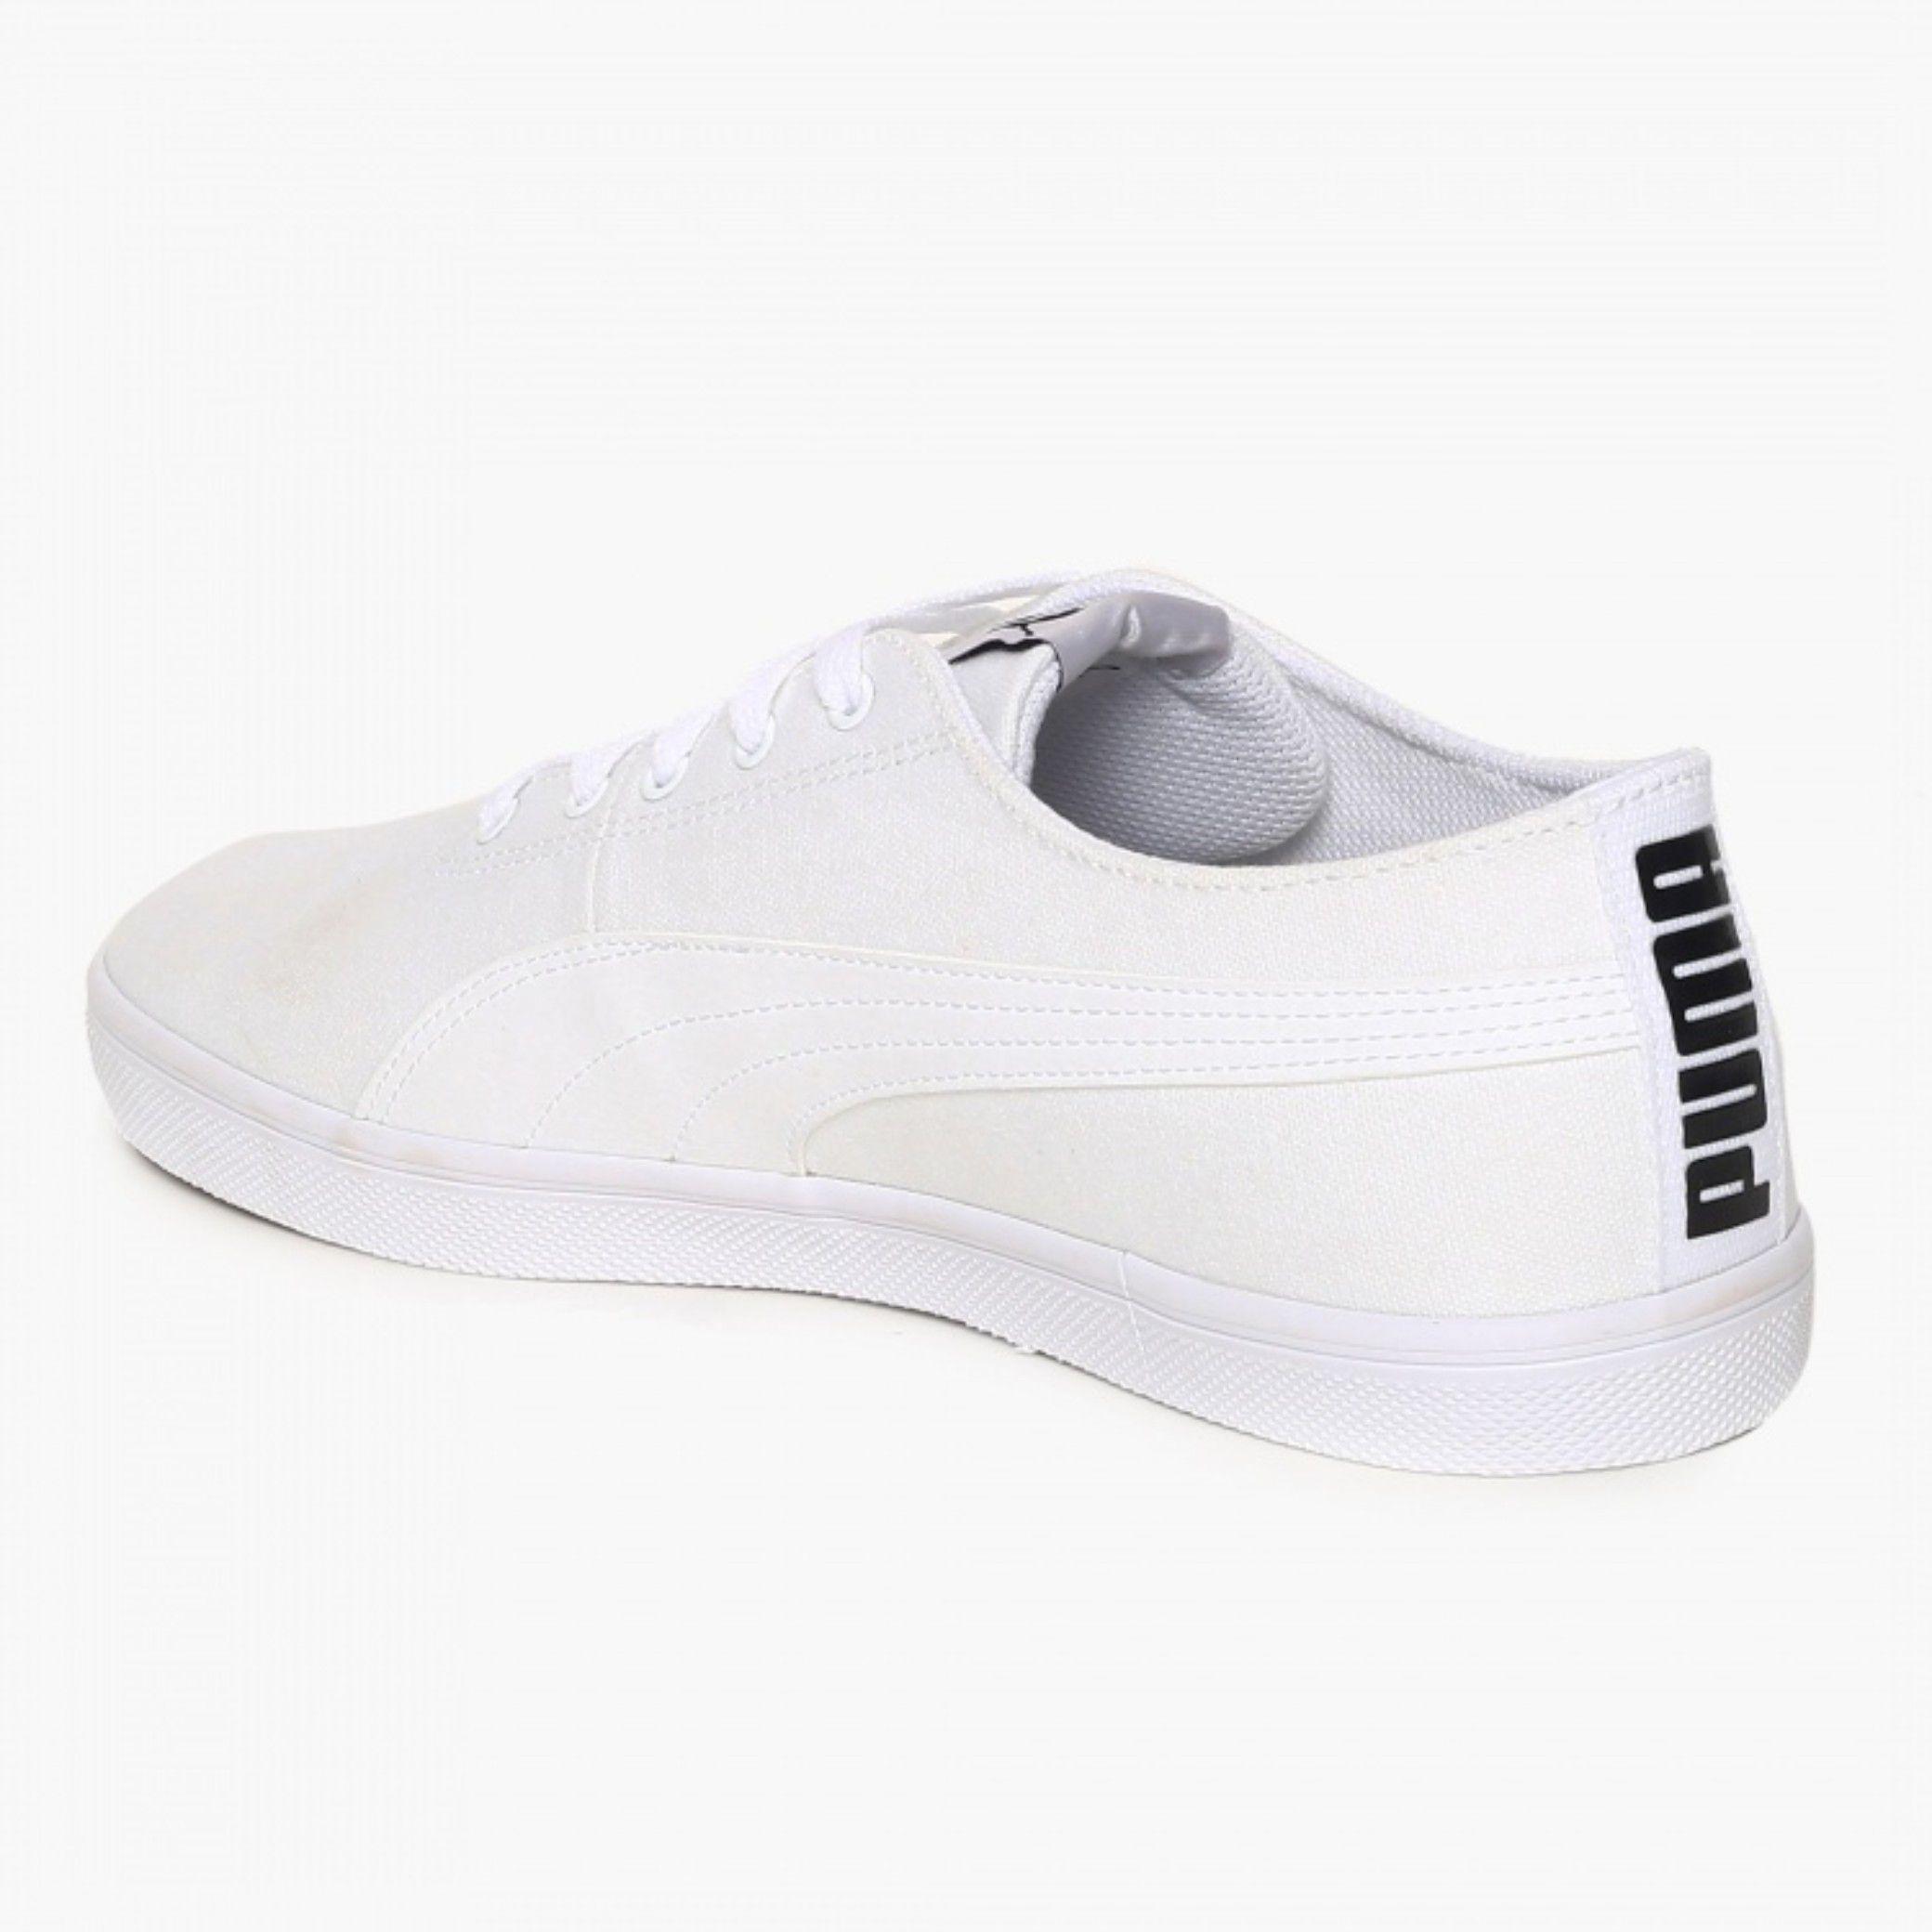 Puma Urban Sneakers White Casual Shoes